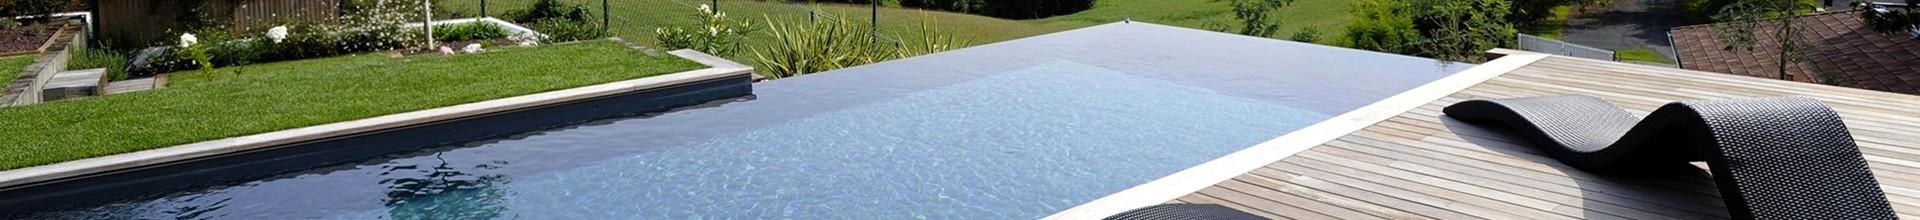 Direct usine, piscine coque prix Esch-Alzette